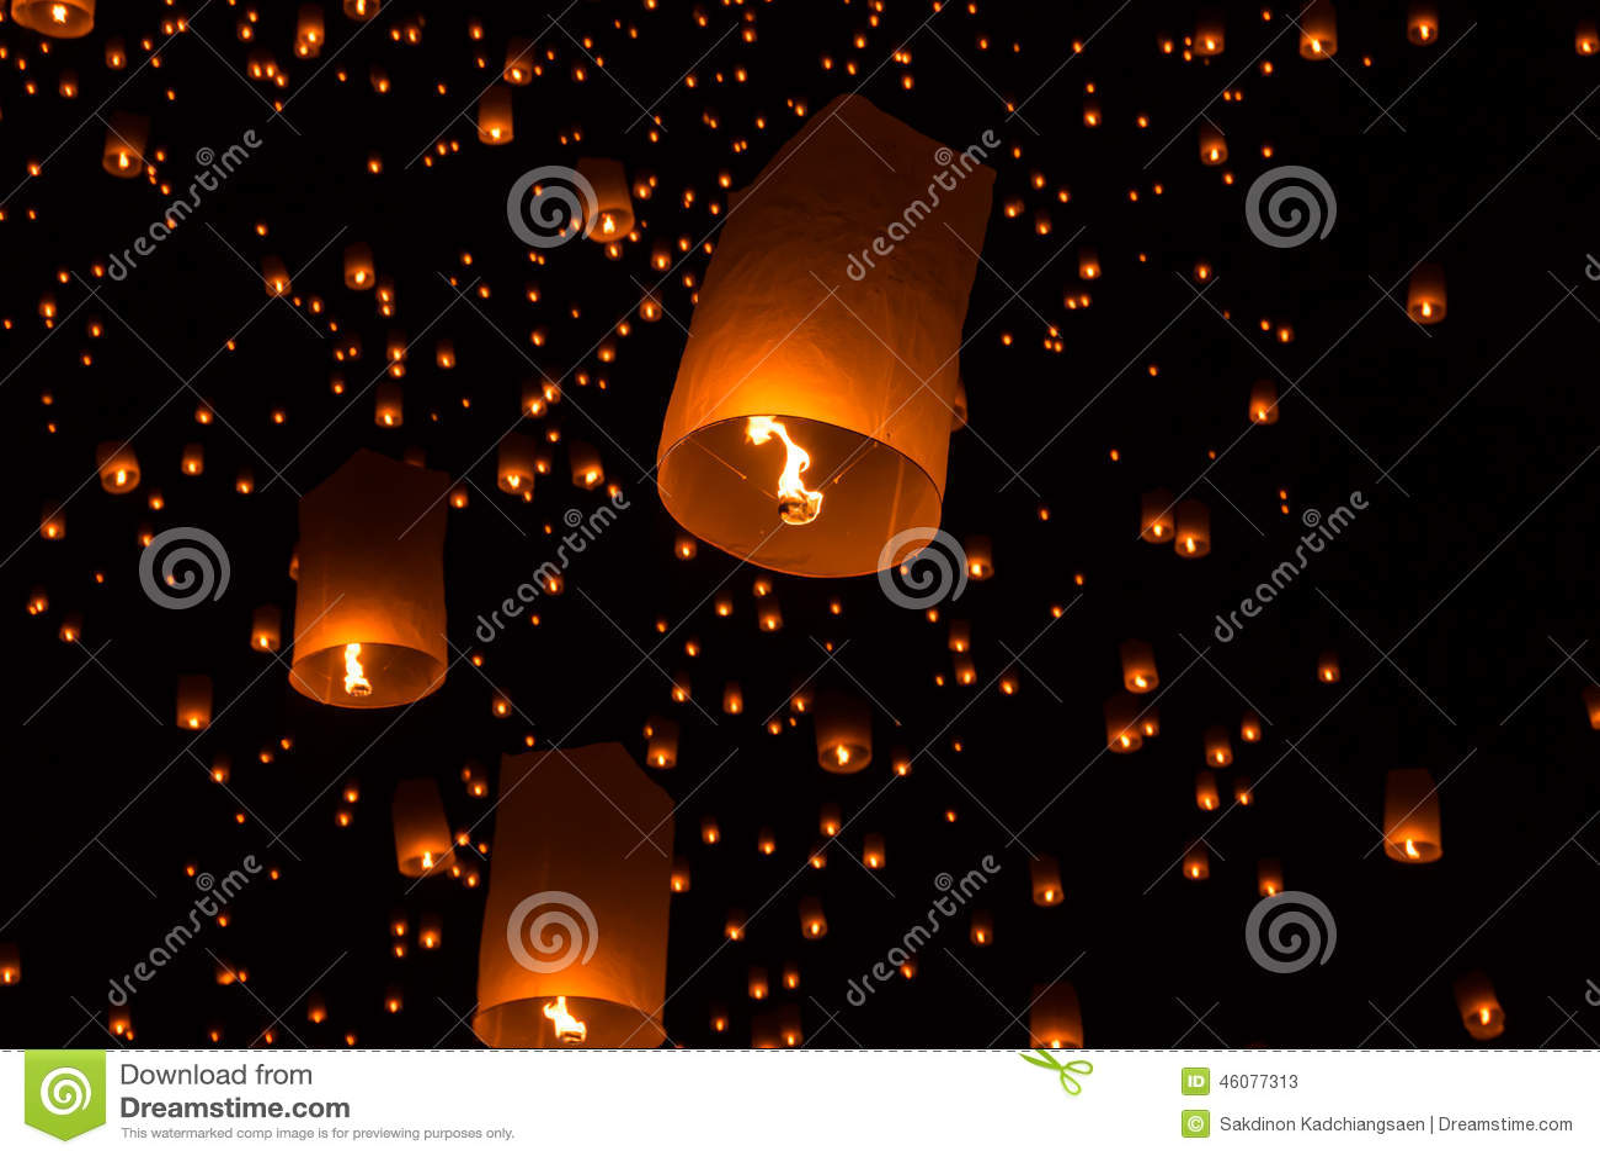 Lanternes de ciel, lanternes volantes